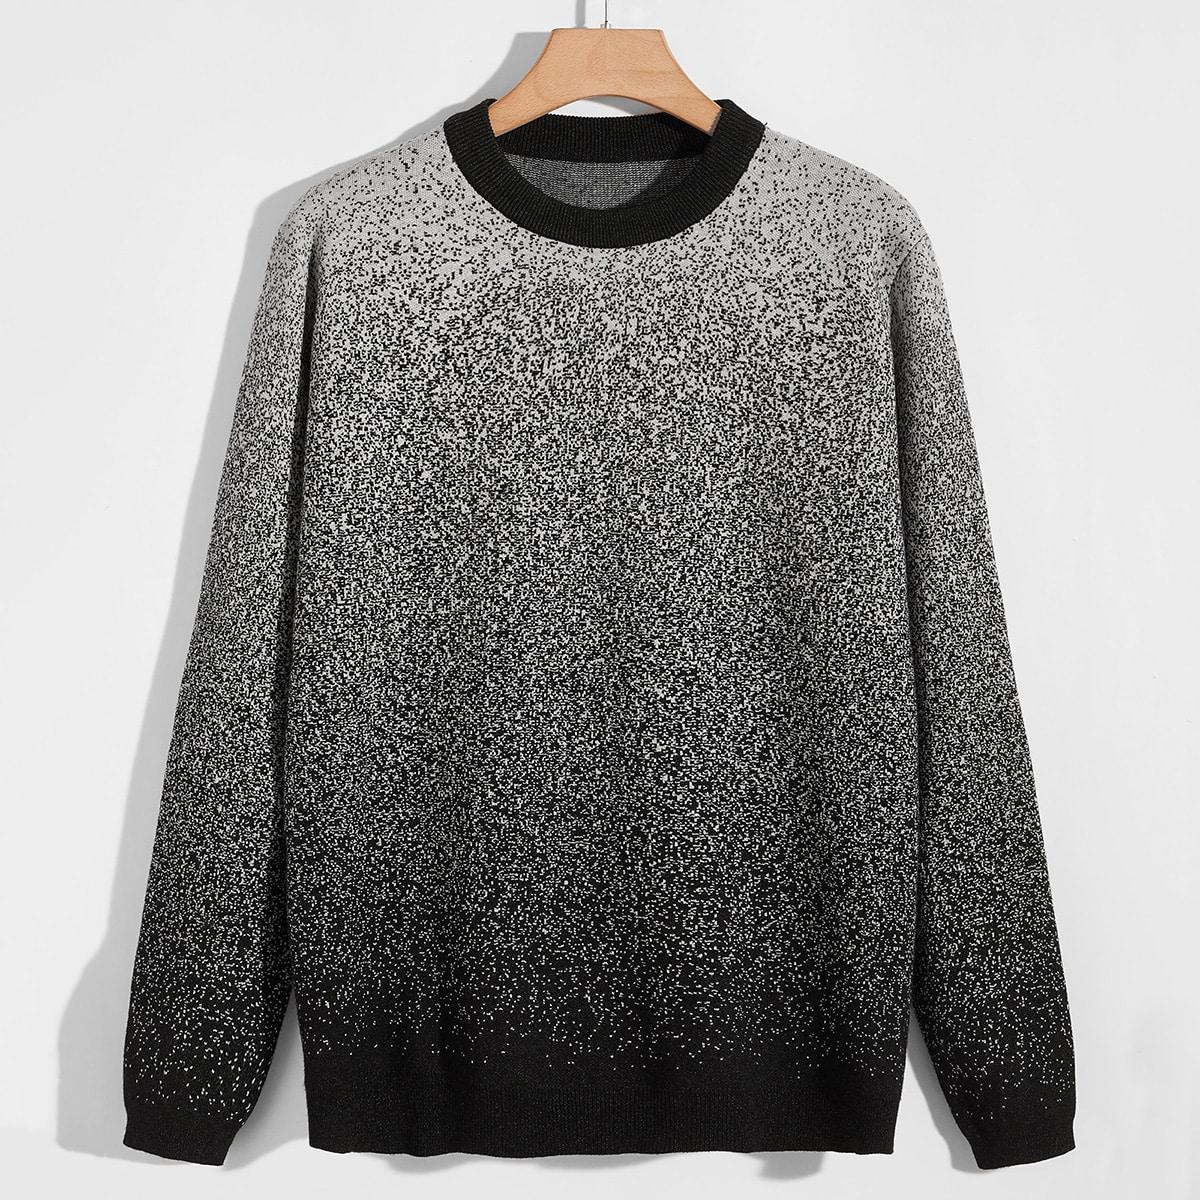 Men Contrast Neck Ombre Sweater